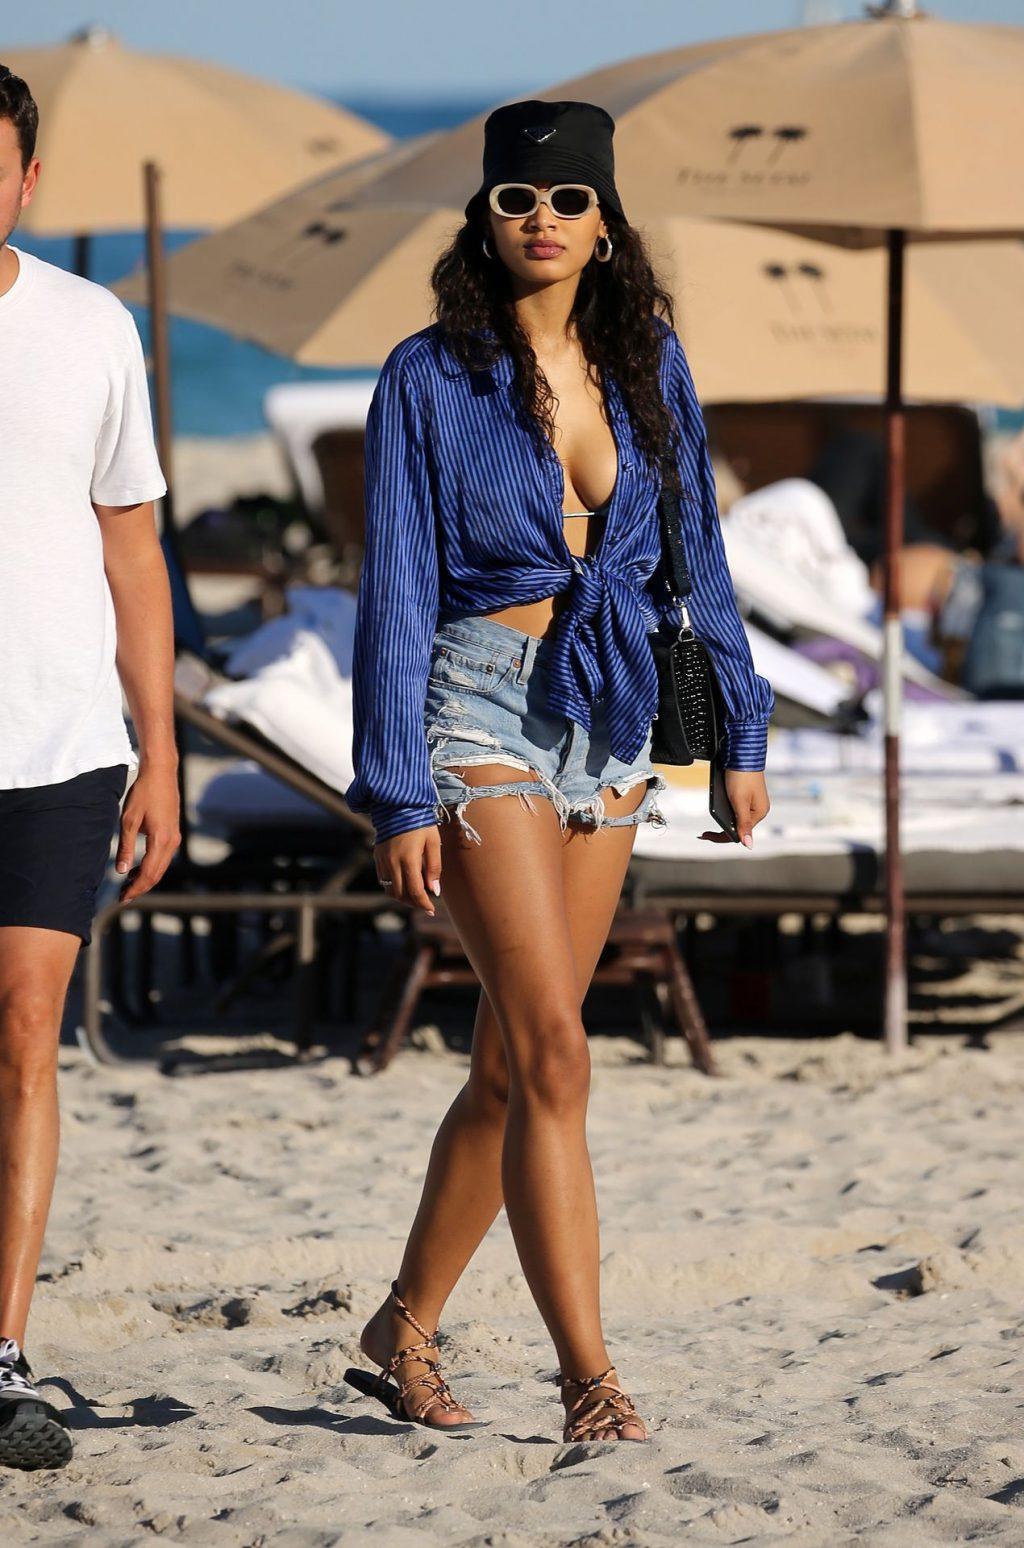 SI Model Danielle Herrington Hits the Beach with Jasmine Sanders in Miami (44 Photos)